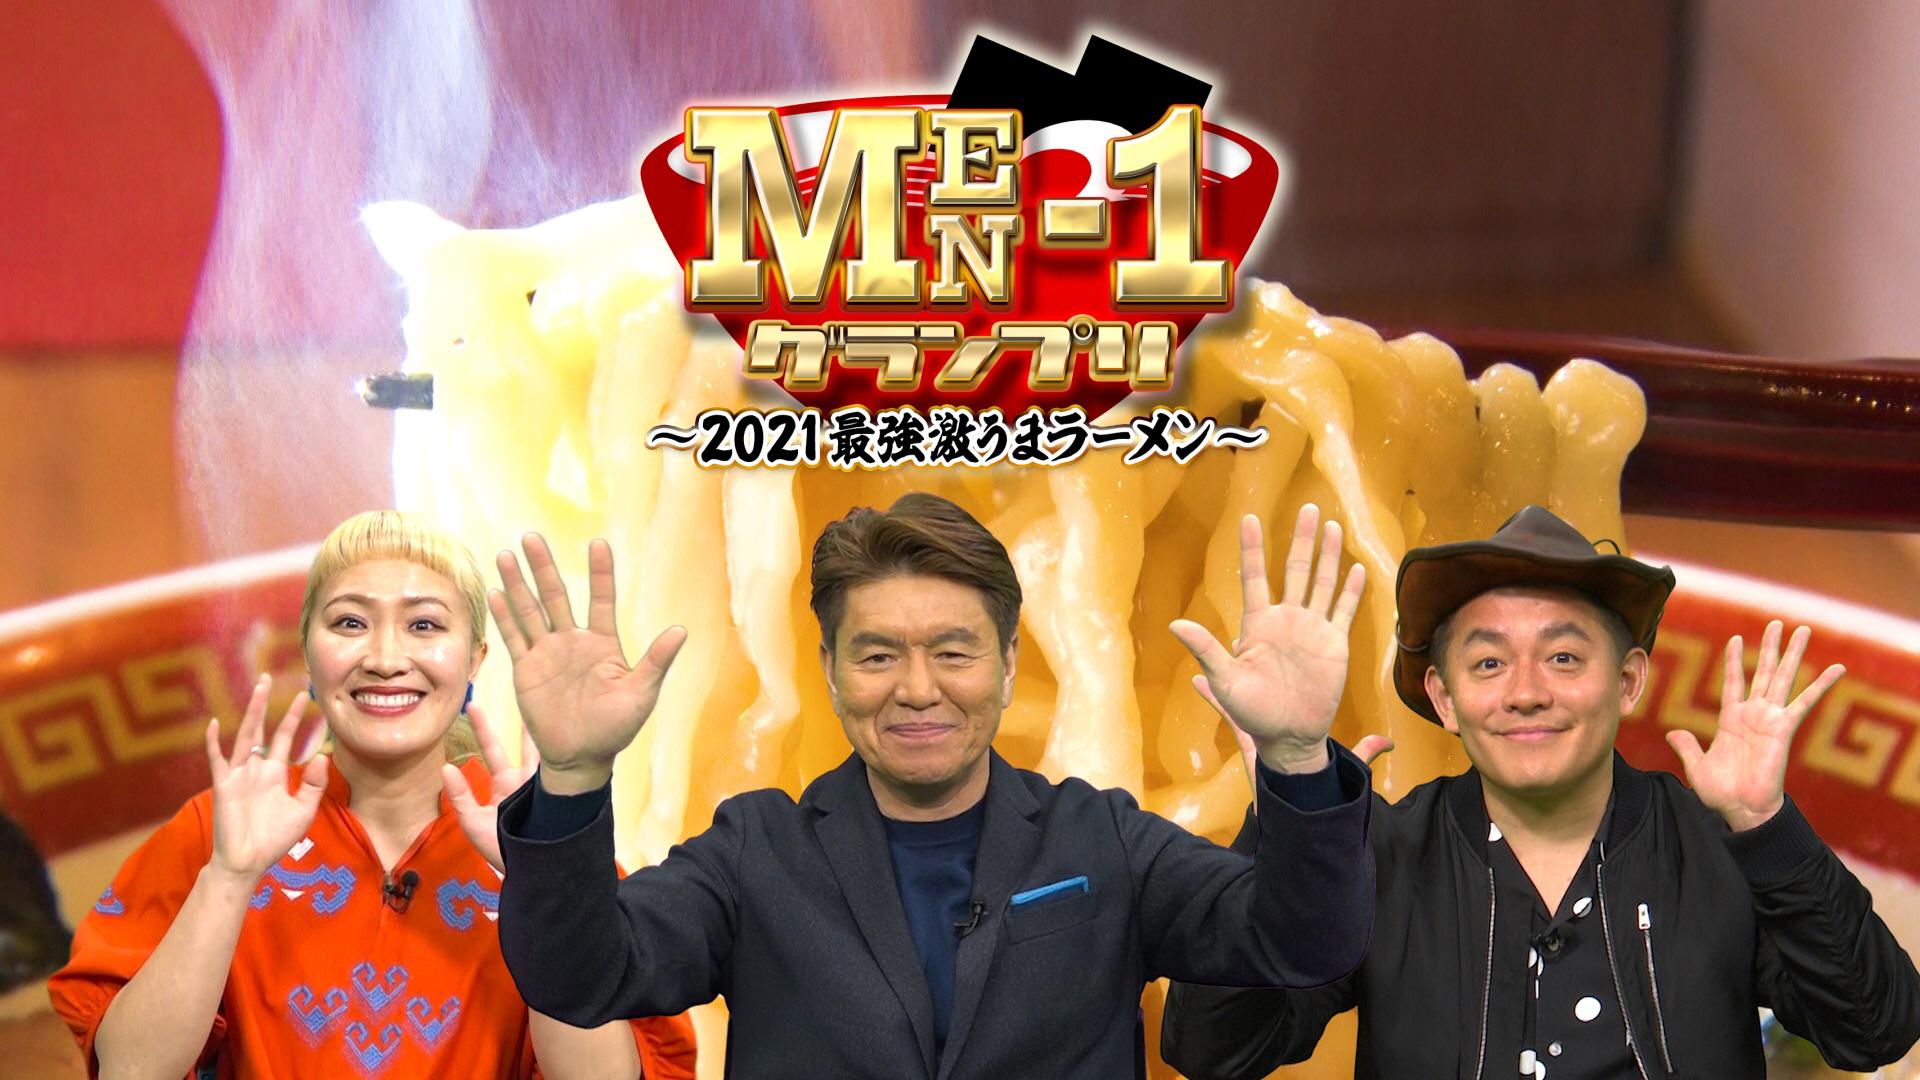 MEN-1グランプリ~2021 動画 2021年2月10日